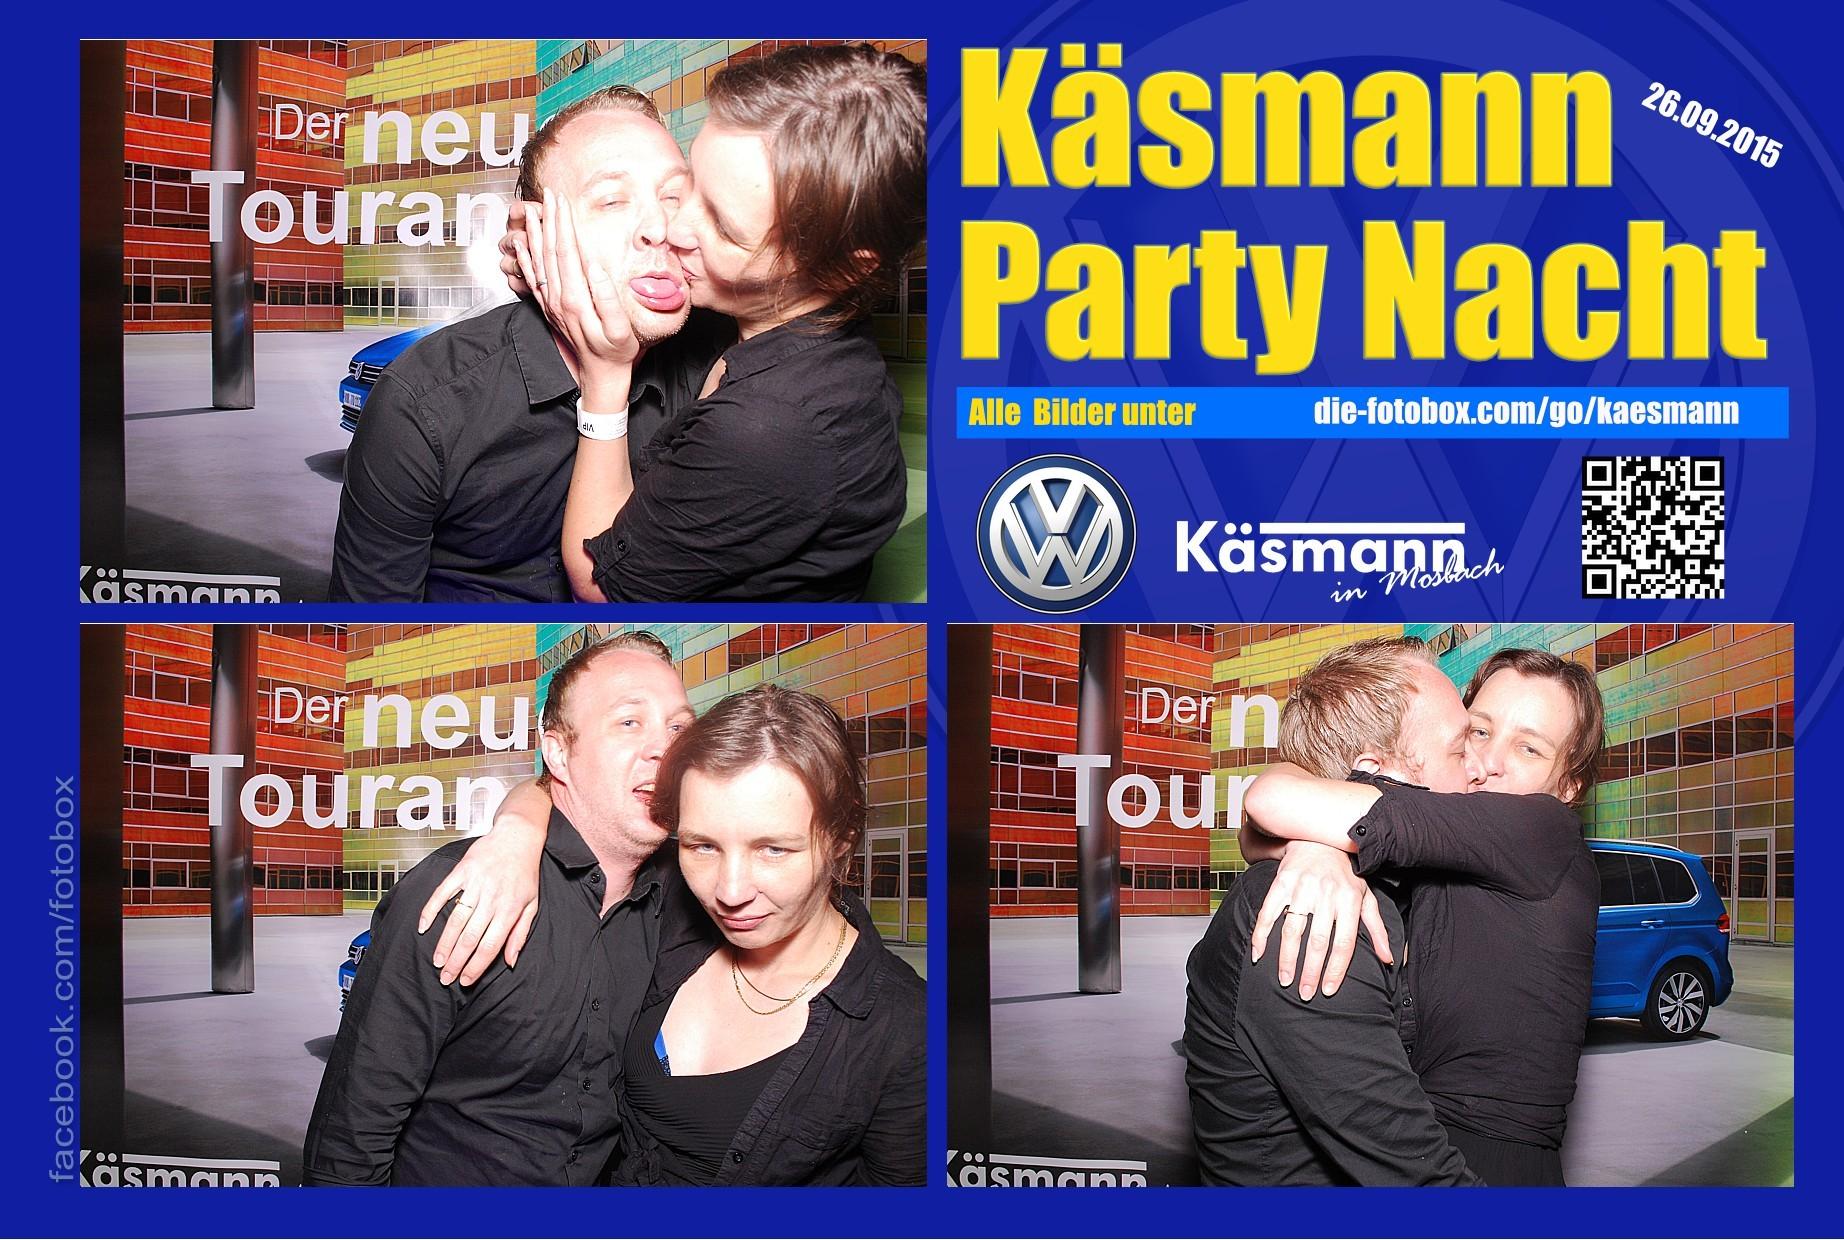 Käsmannparty 2015 - www.die-fotobox.com 01376